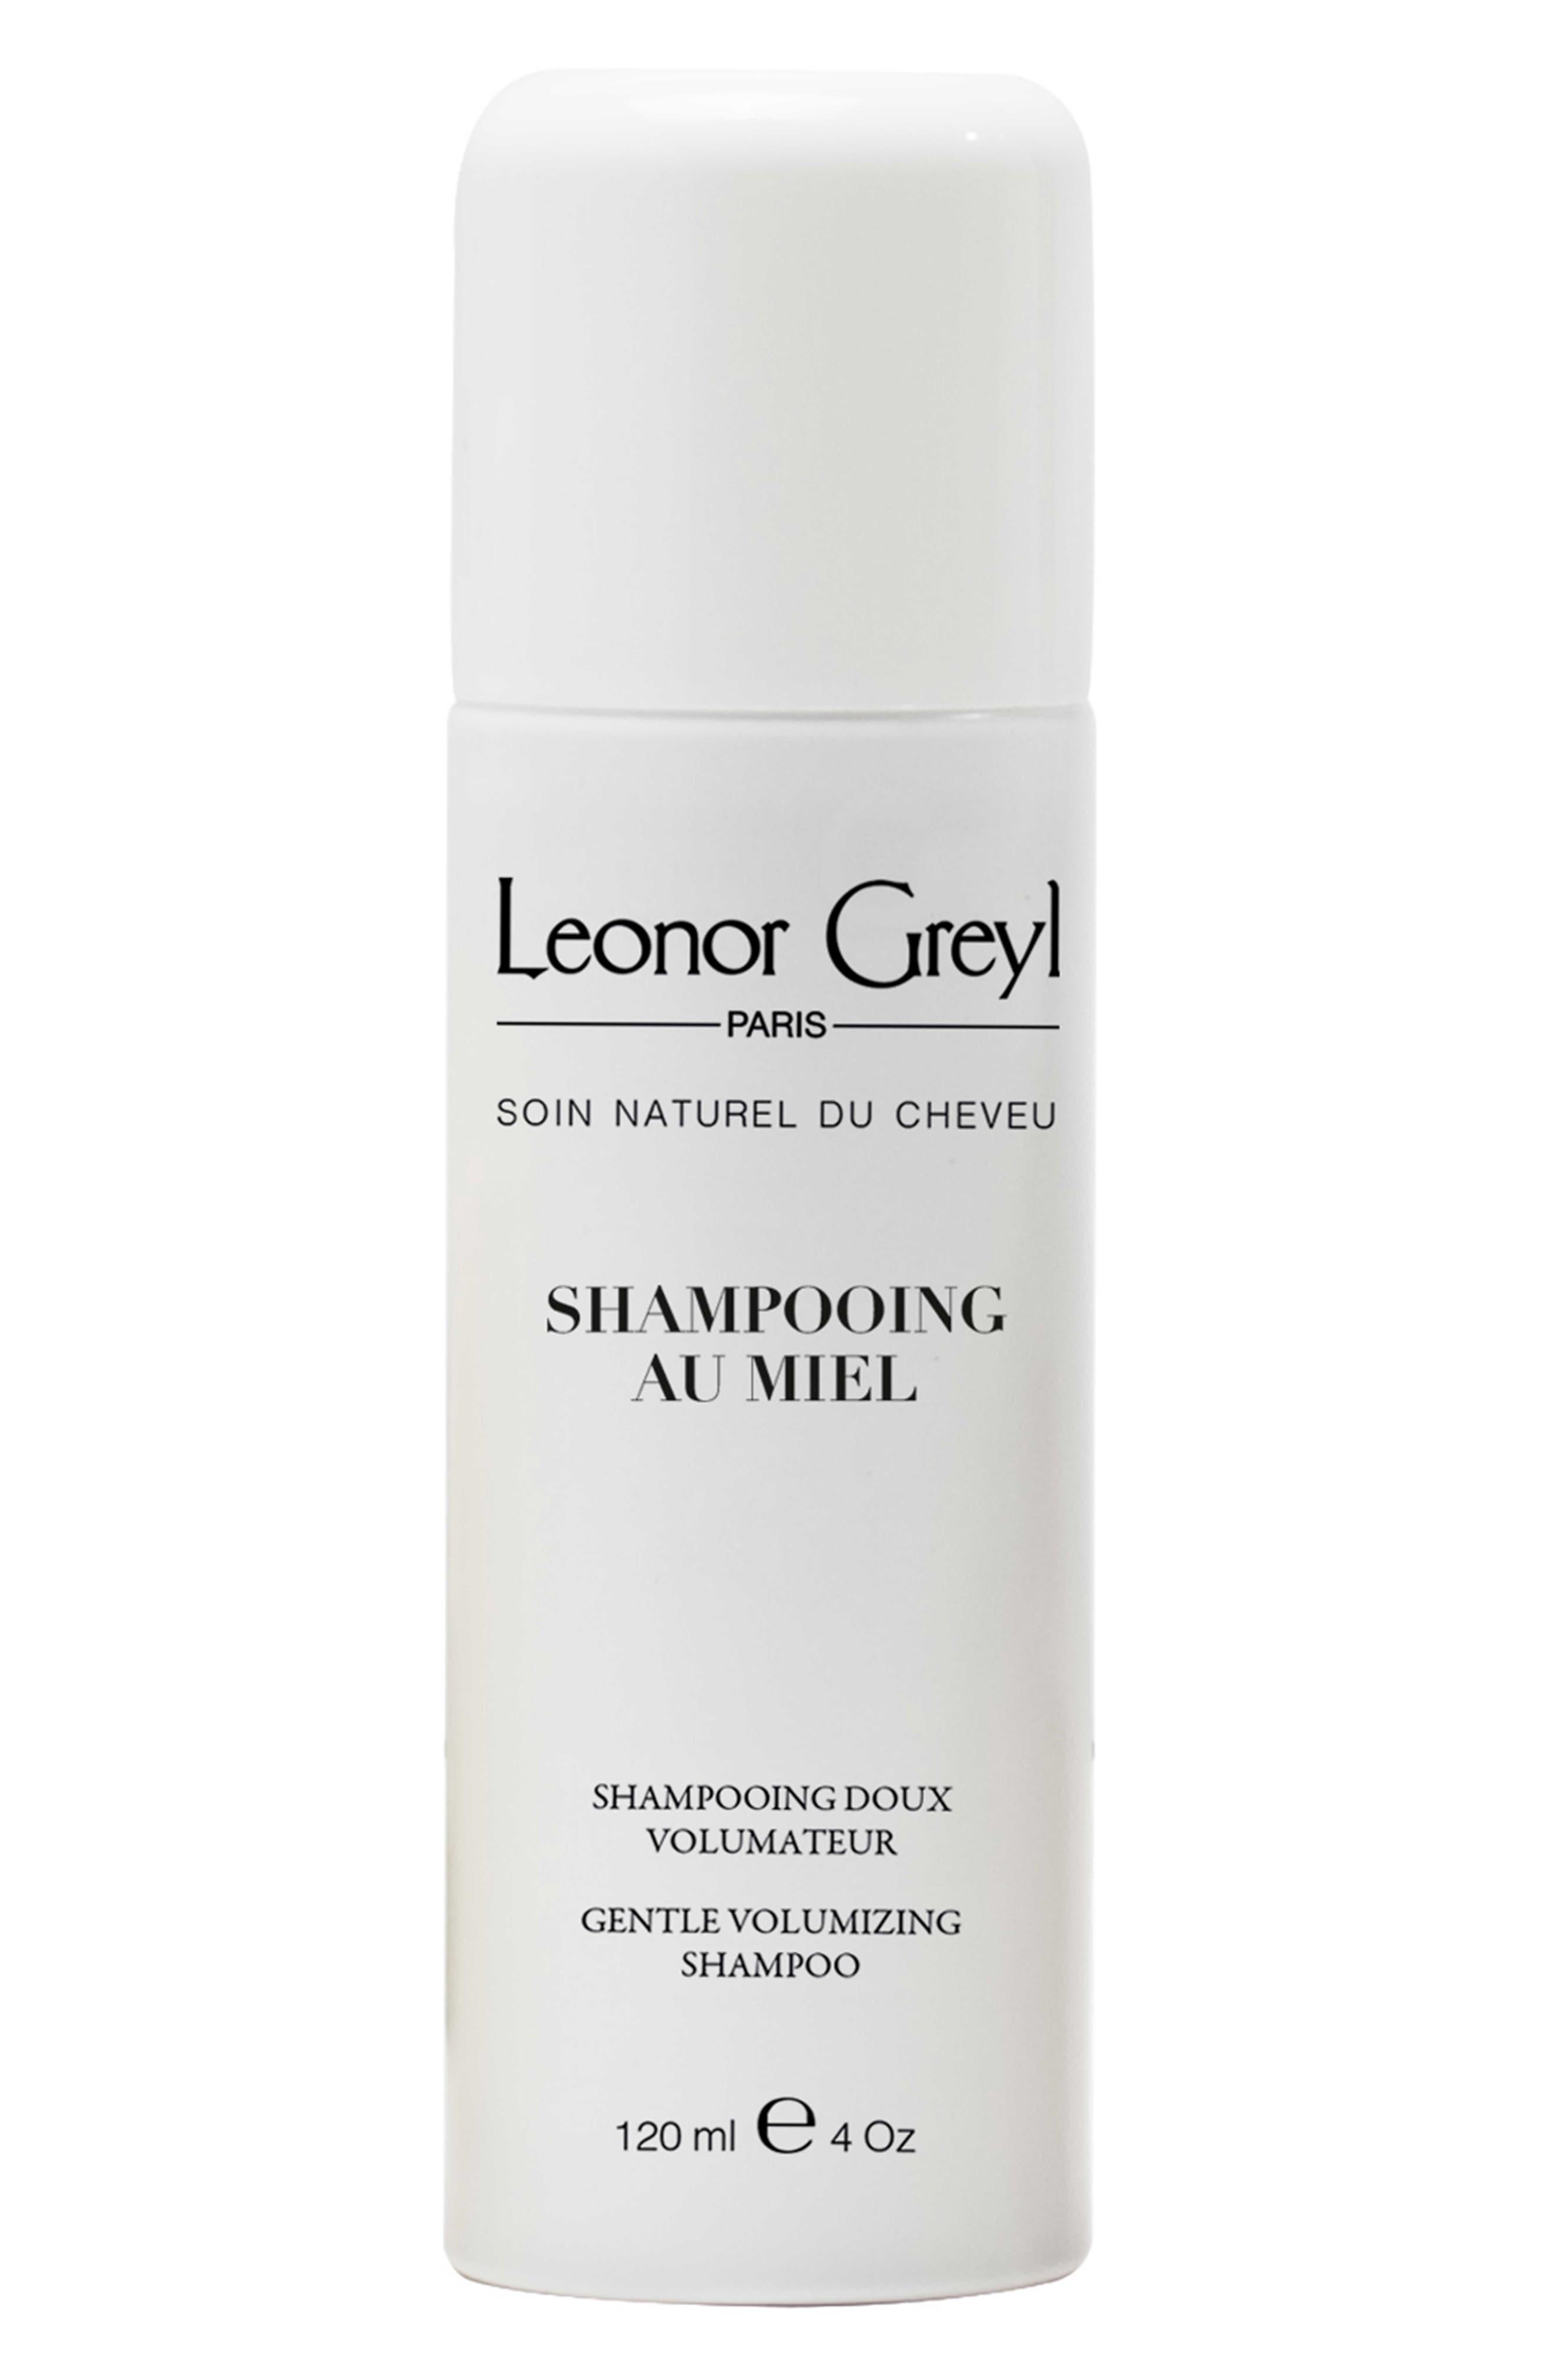 Alternate Image 1 Selected - Leonor Greyl PARIS 'Shampooing au Miel' Volumizing Shampoo